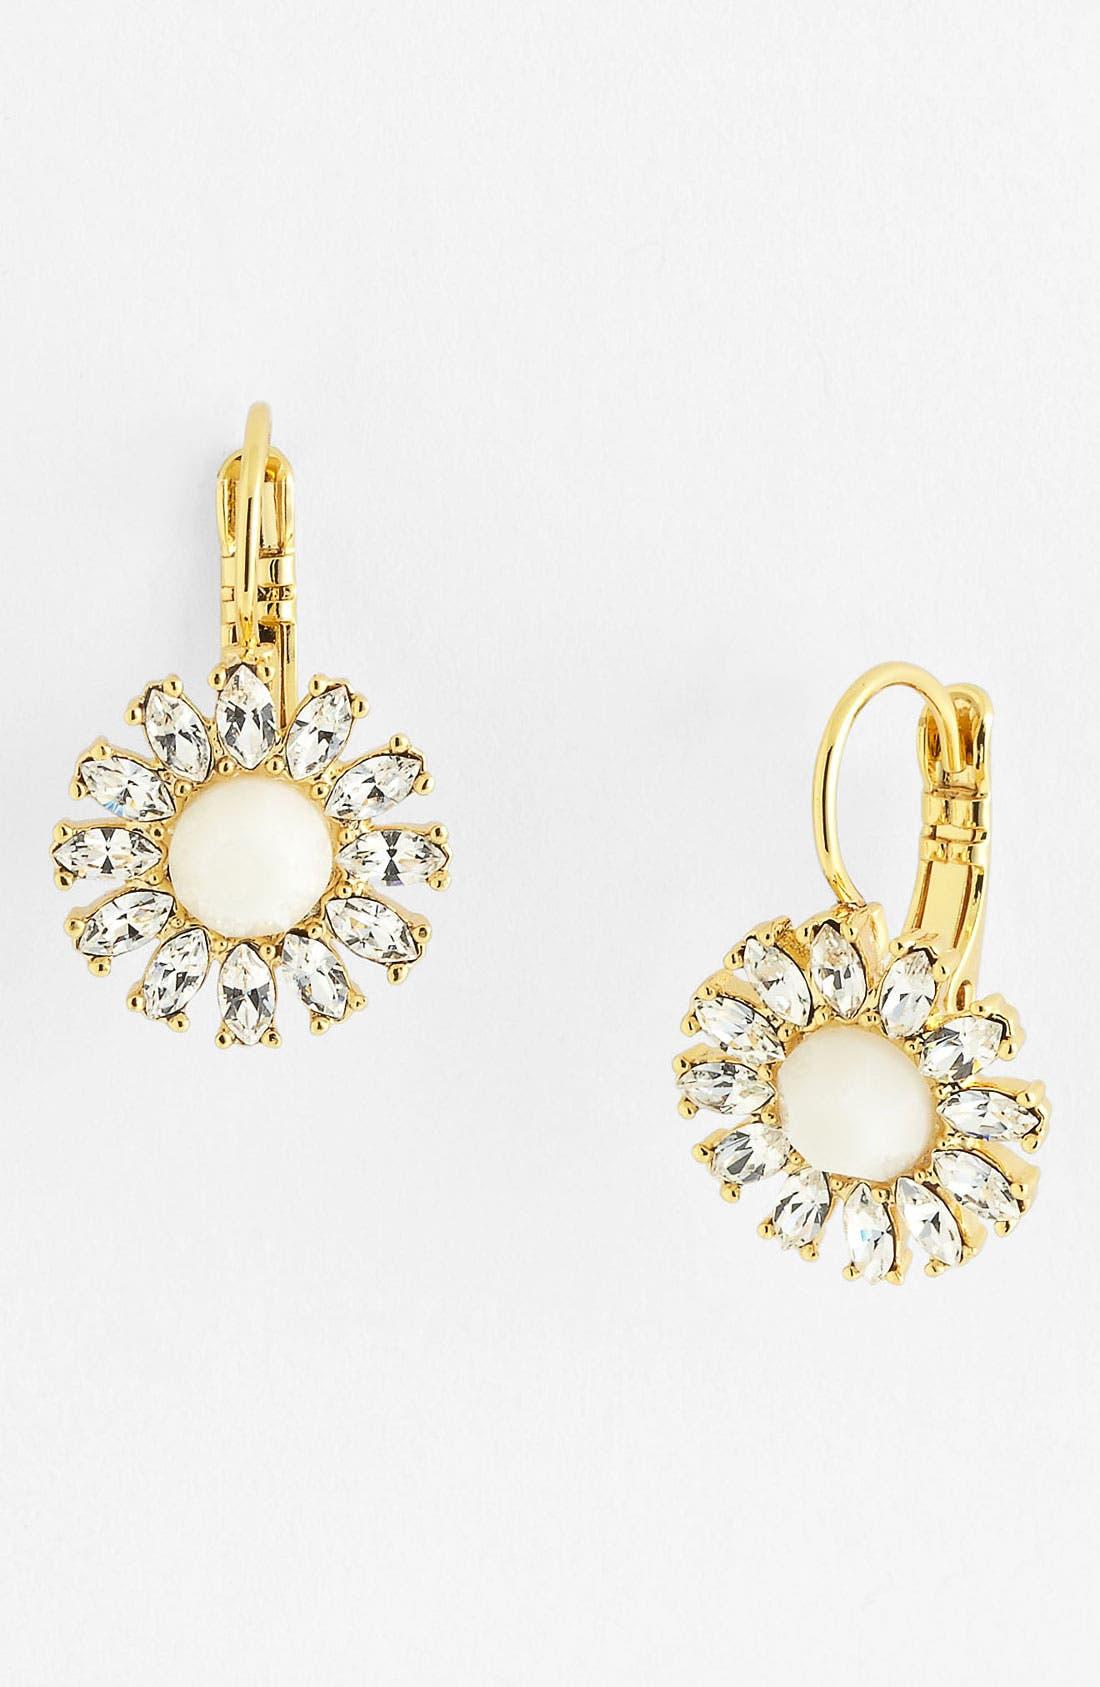 Main Image - kate spade new york 'estate garden' drop earrings